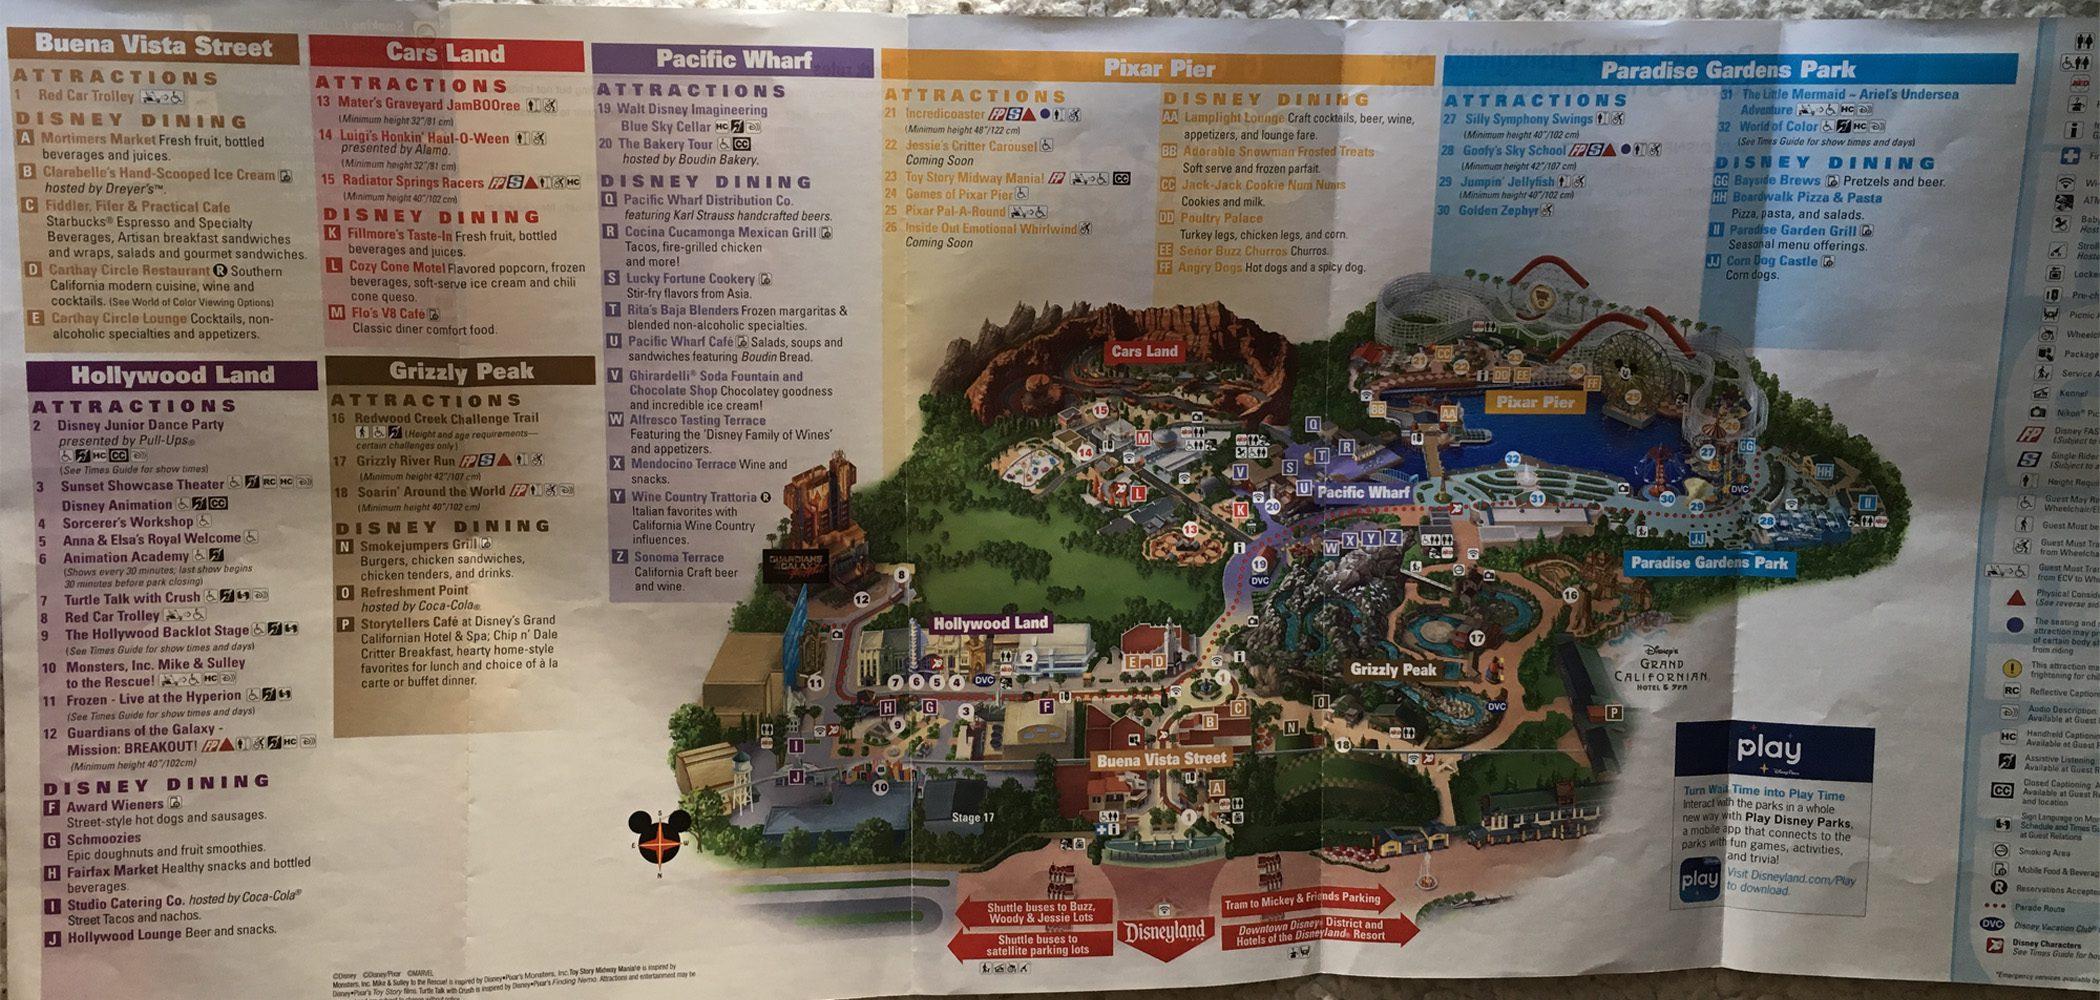 2018 California Adventure Halloween Town Map